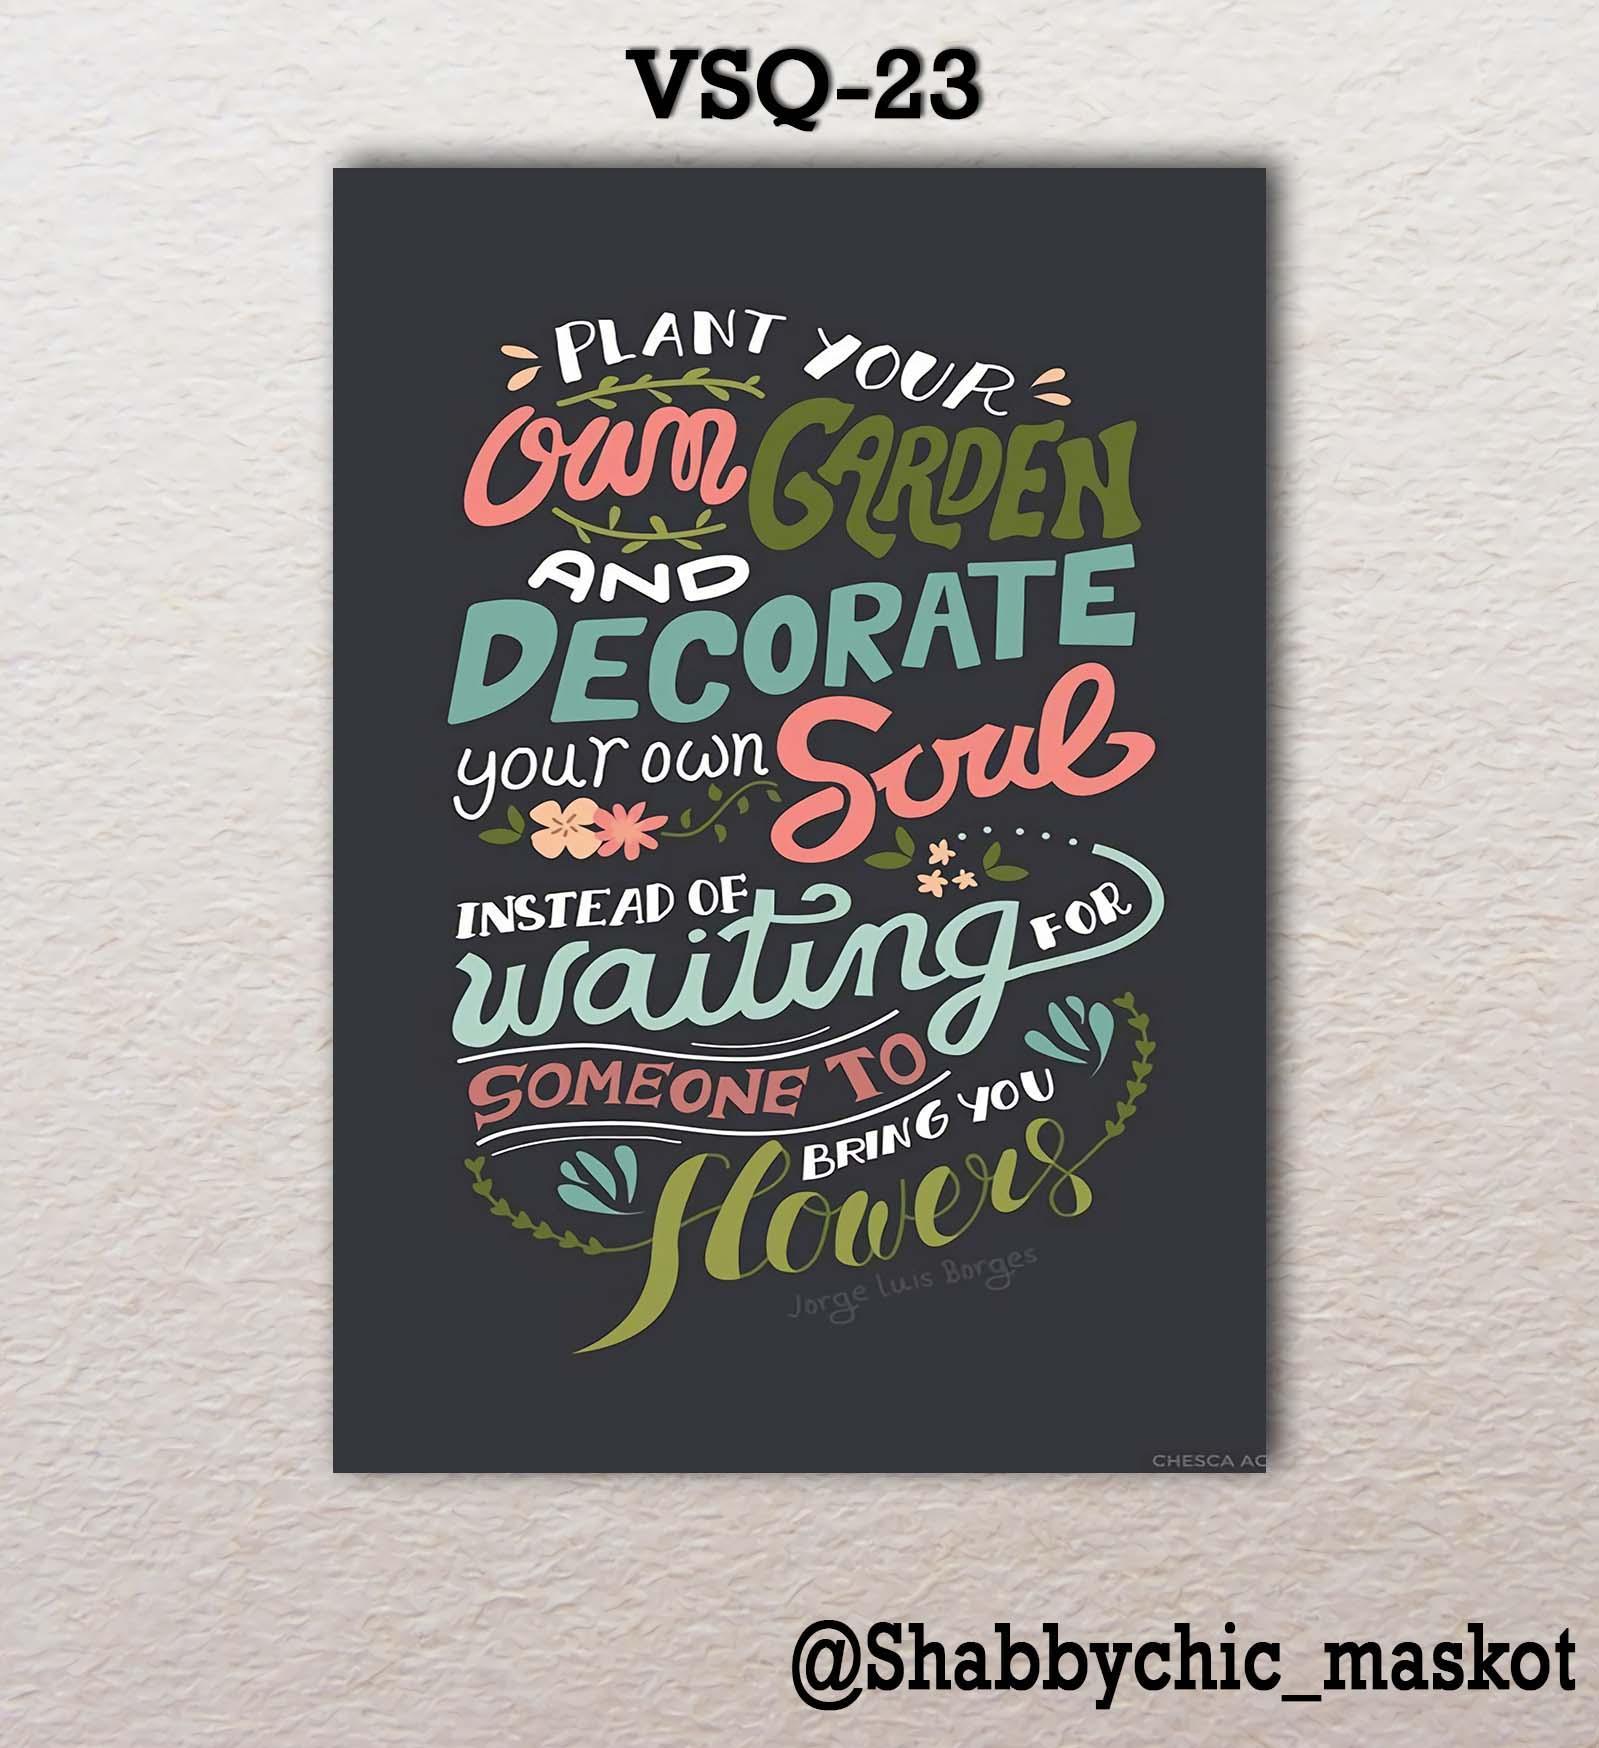 Vasty Hiasan Dinding Kayu Wall Decor Poster Super Quotes VSQ-23